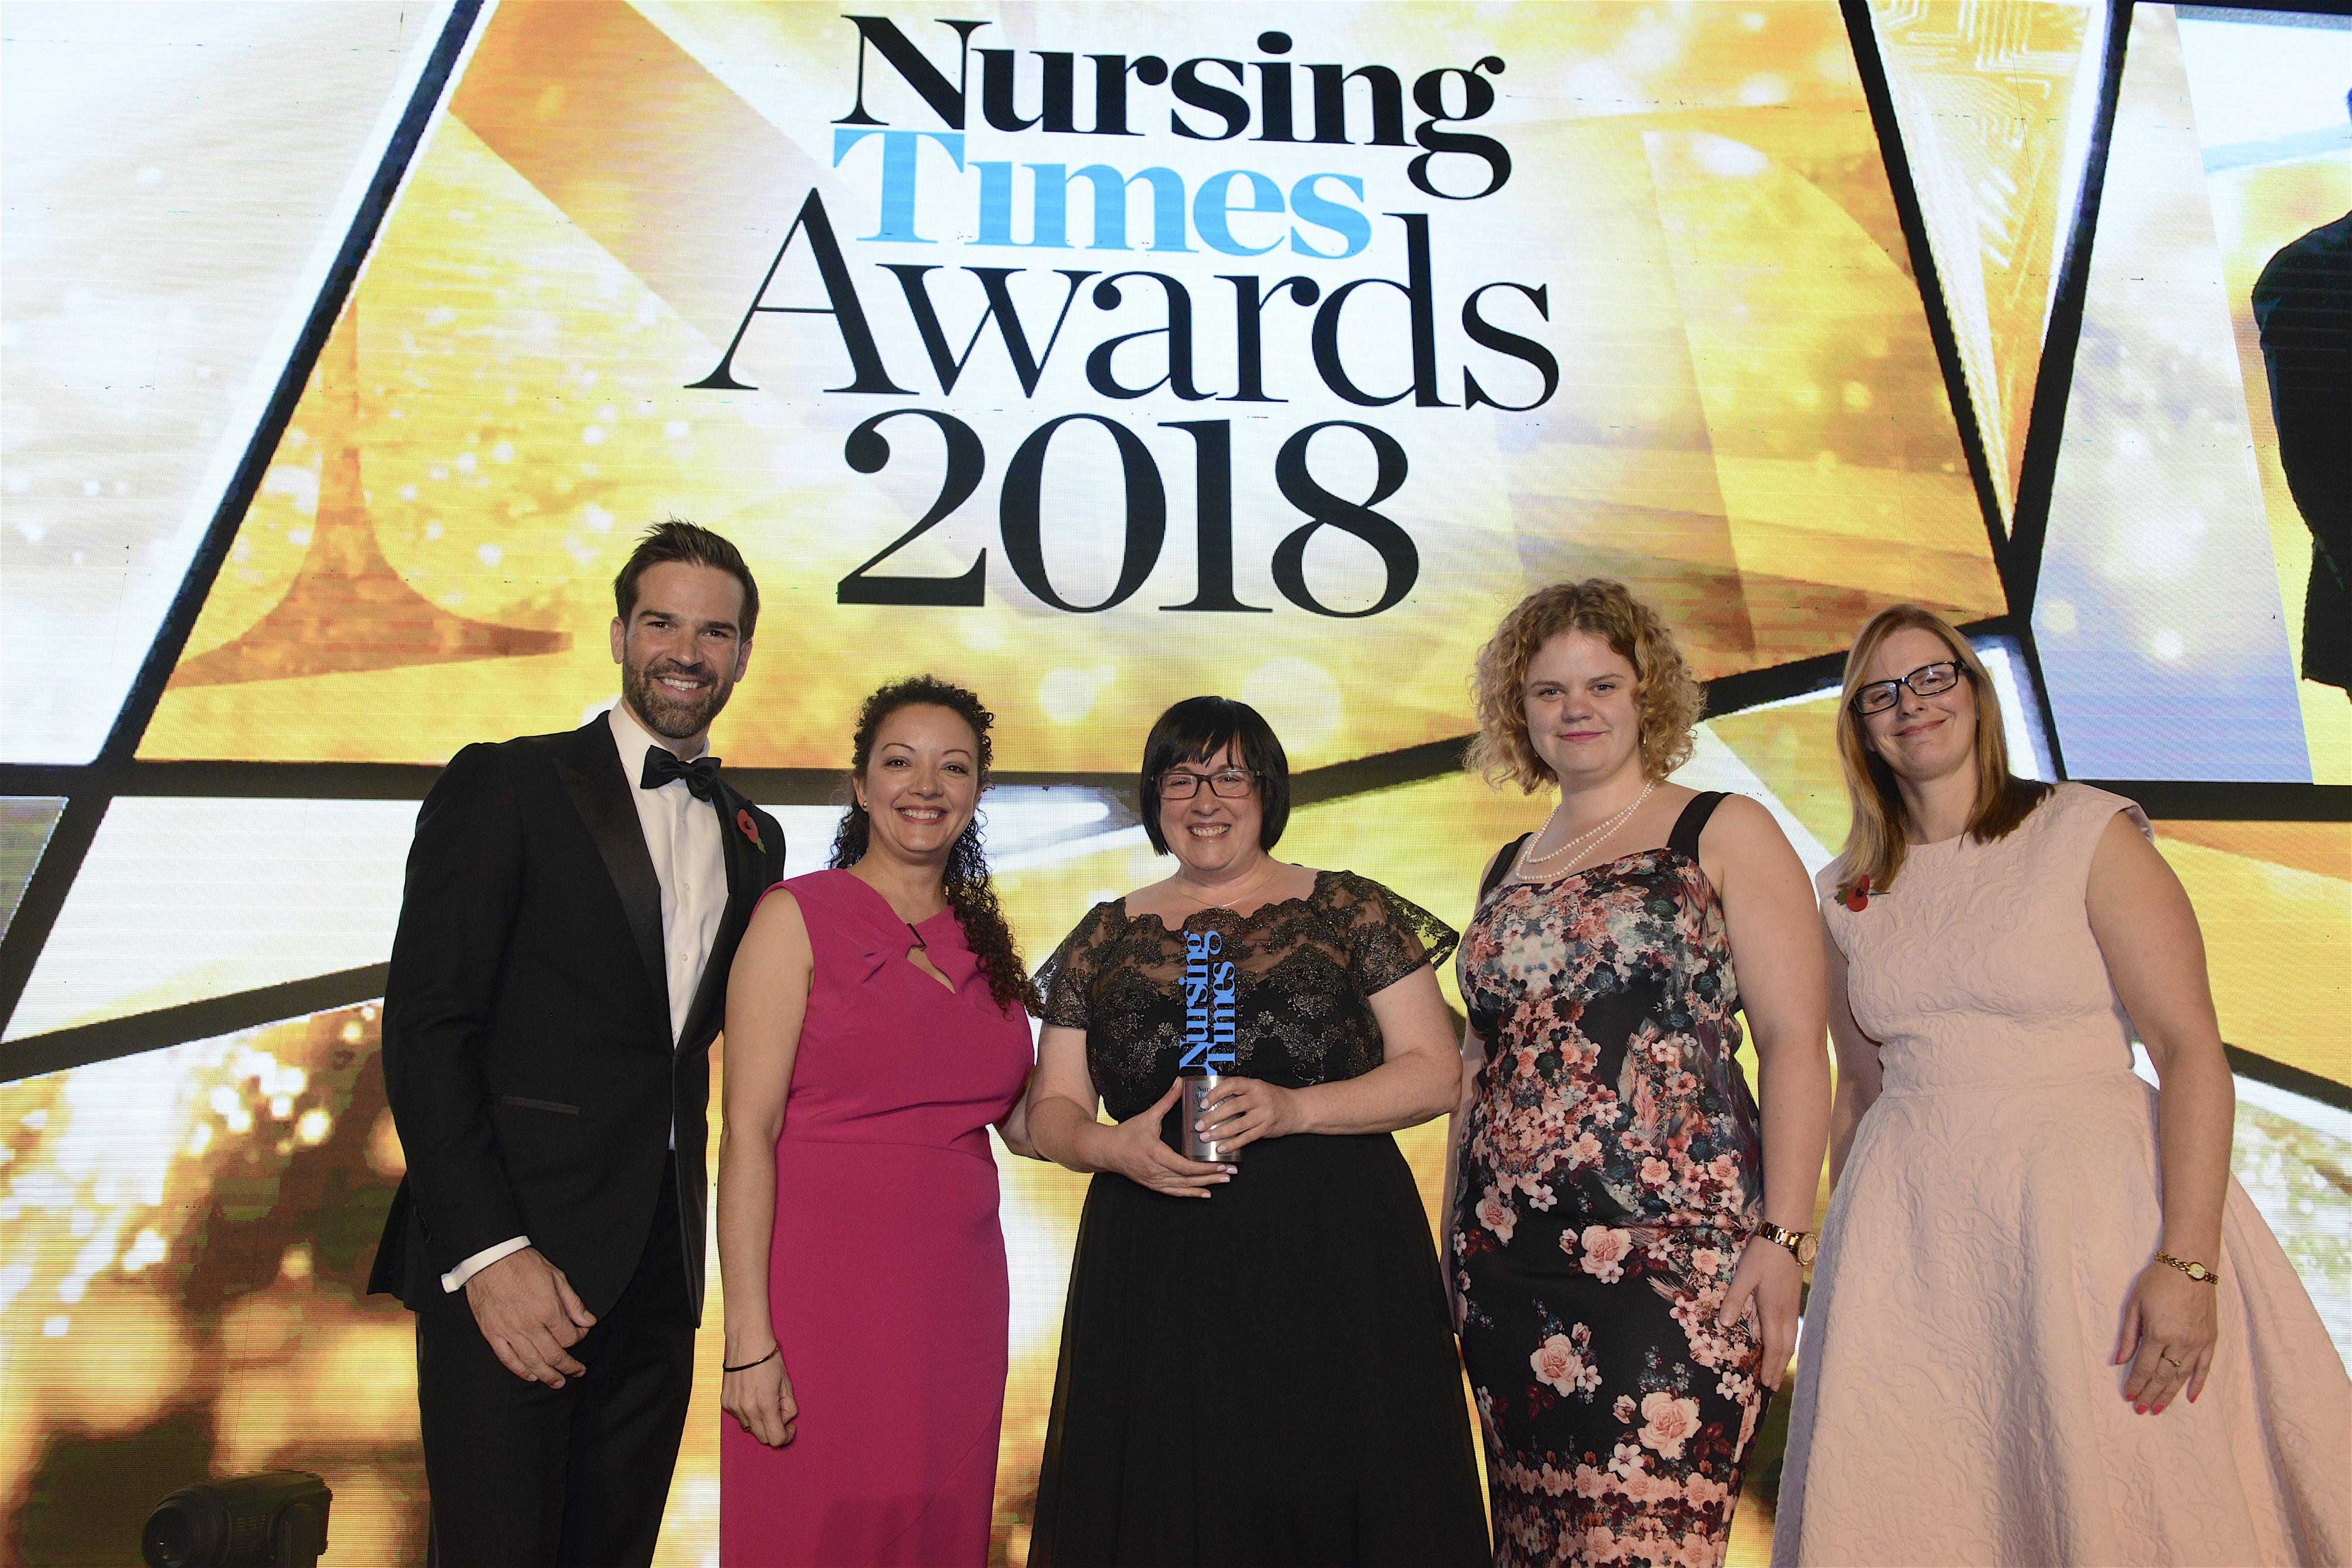 Winners of the Nursing Times Awards 2018